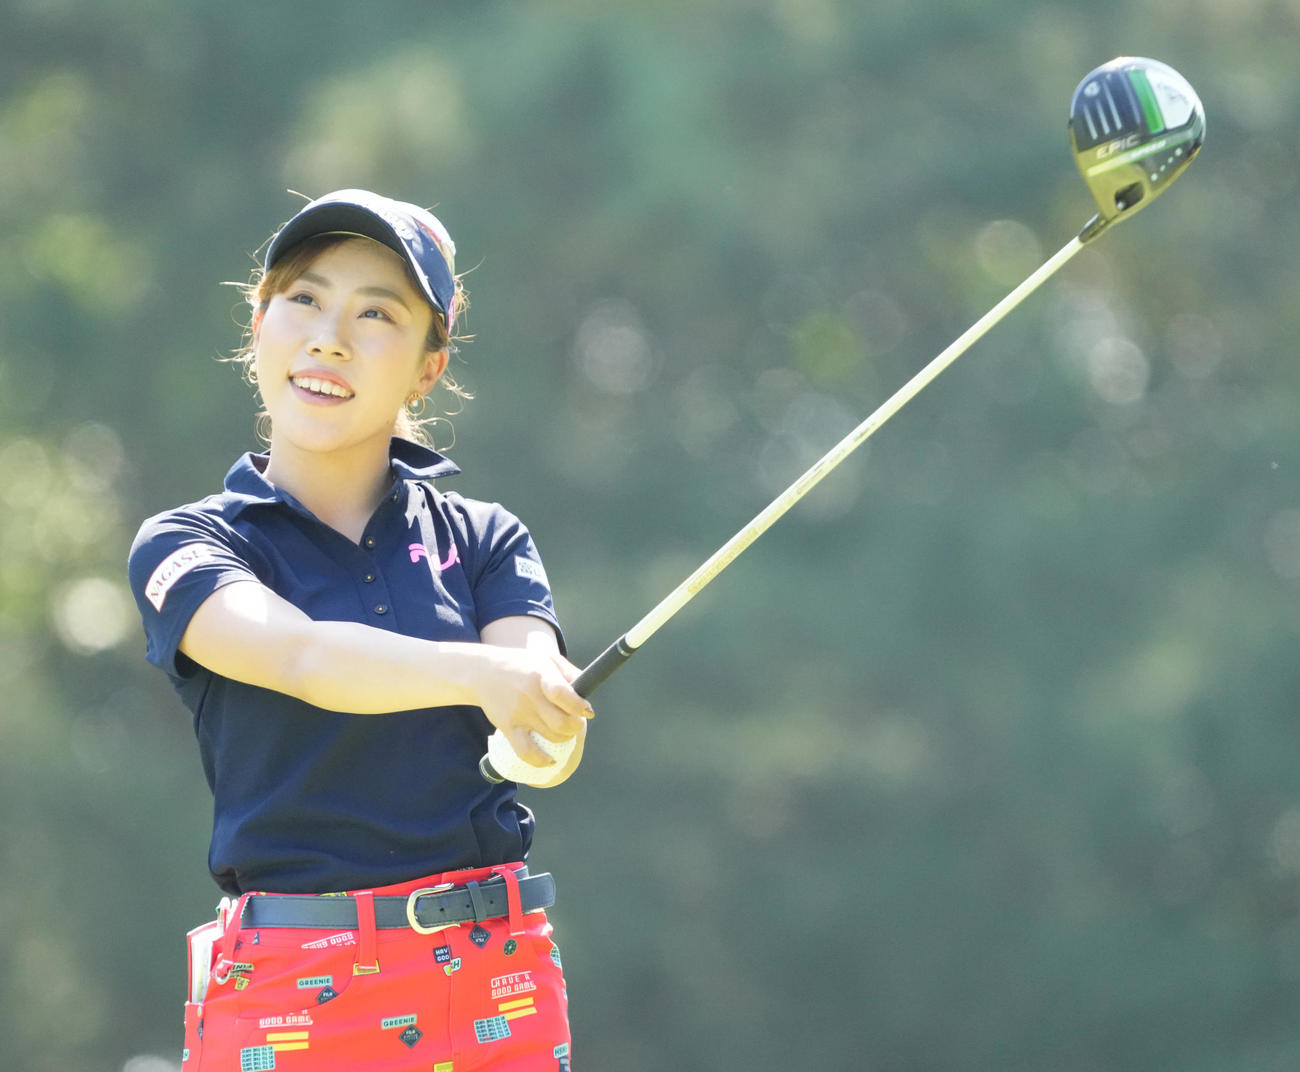 https://www.nikkansports.com/sports/golf/news/img/202106100000032-w1300_17.jpg